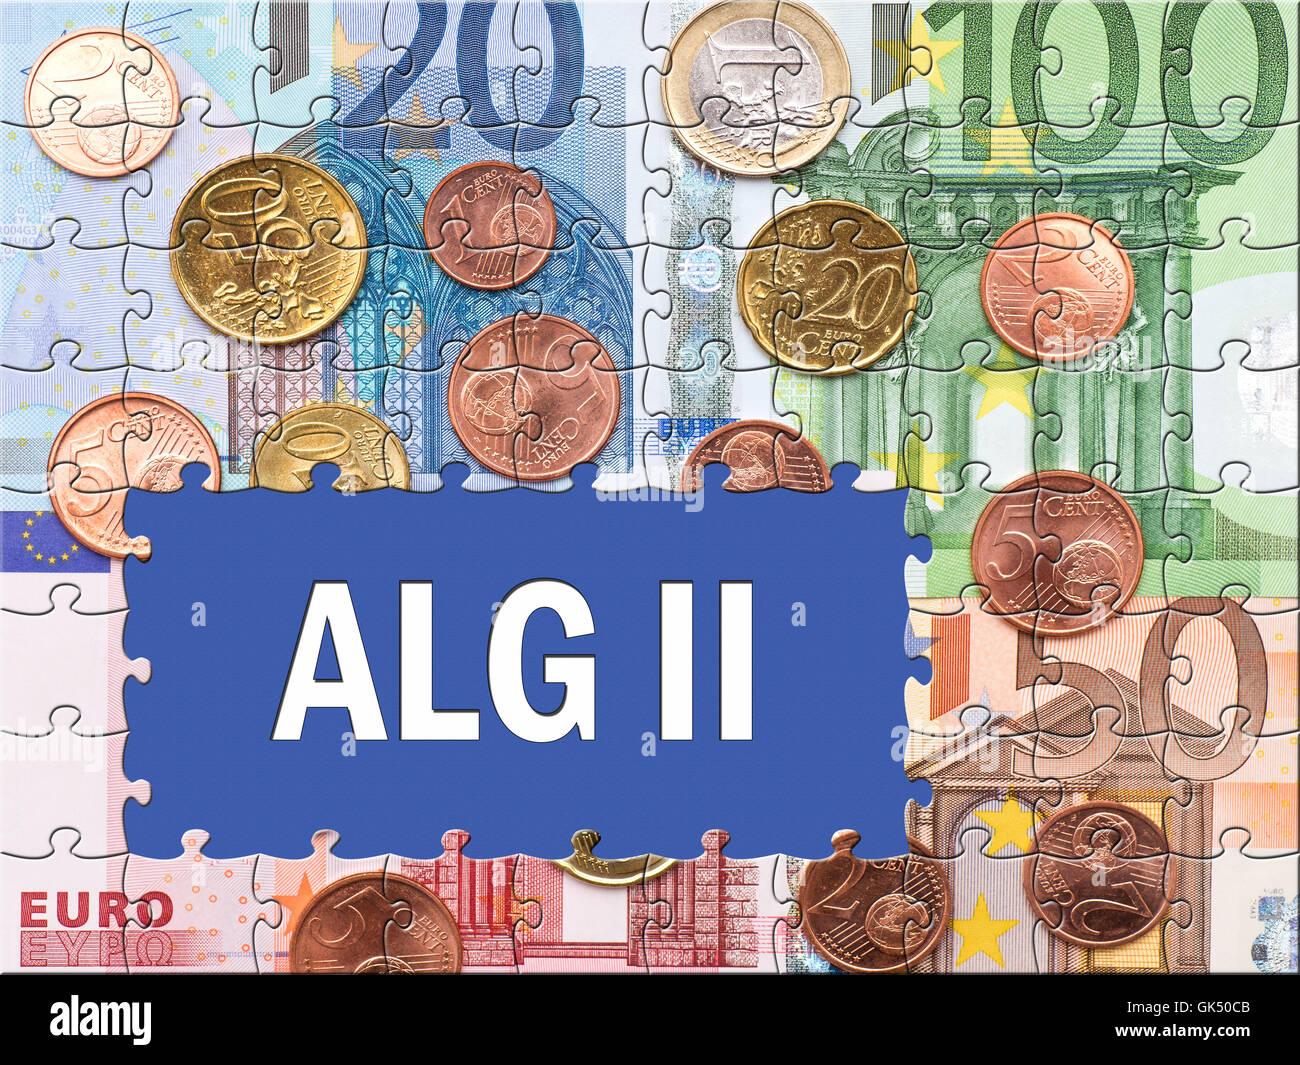 alg ii - unemployment benefit ii - Stock Image